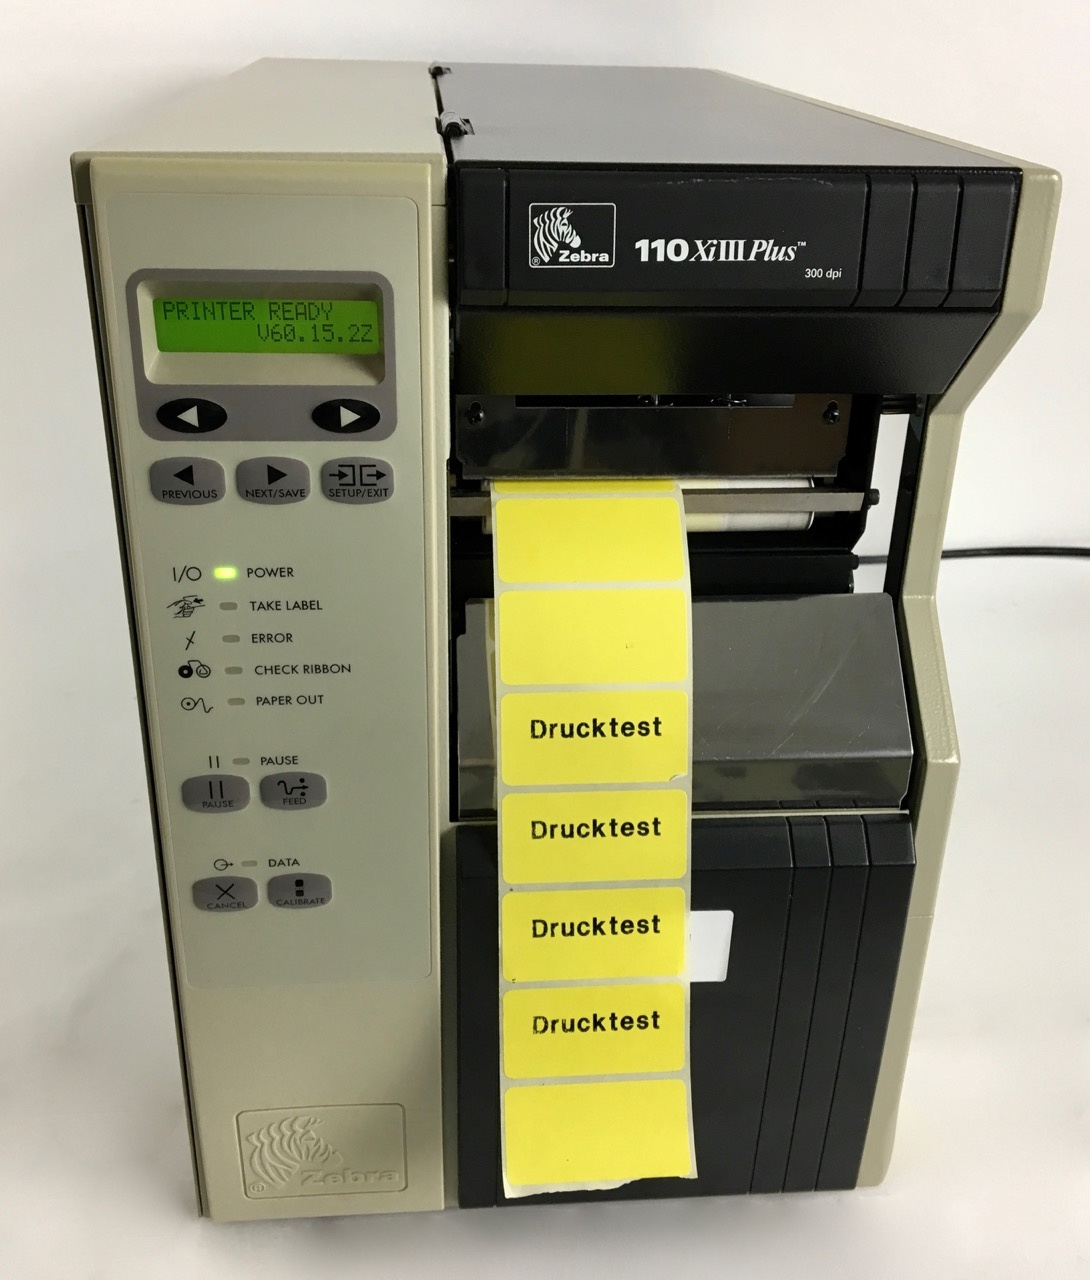 Zebra Zebra 110XiIII Plus label/ thermal printer (300 dpi)